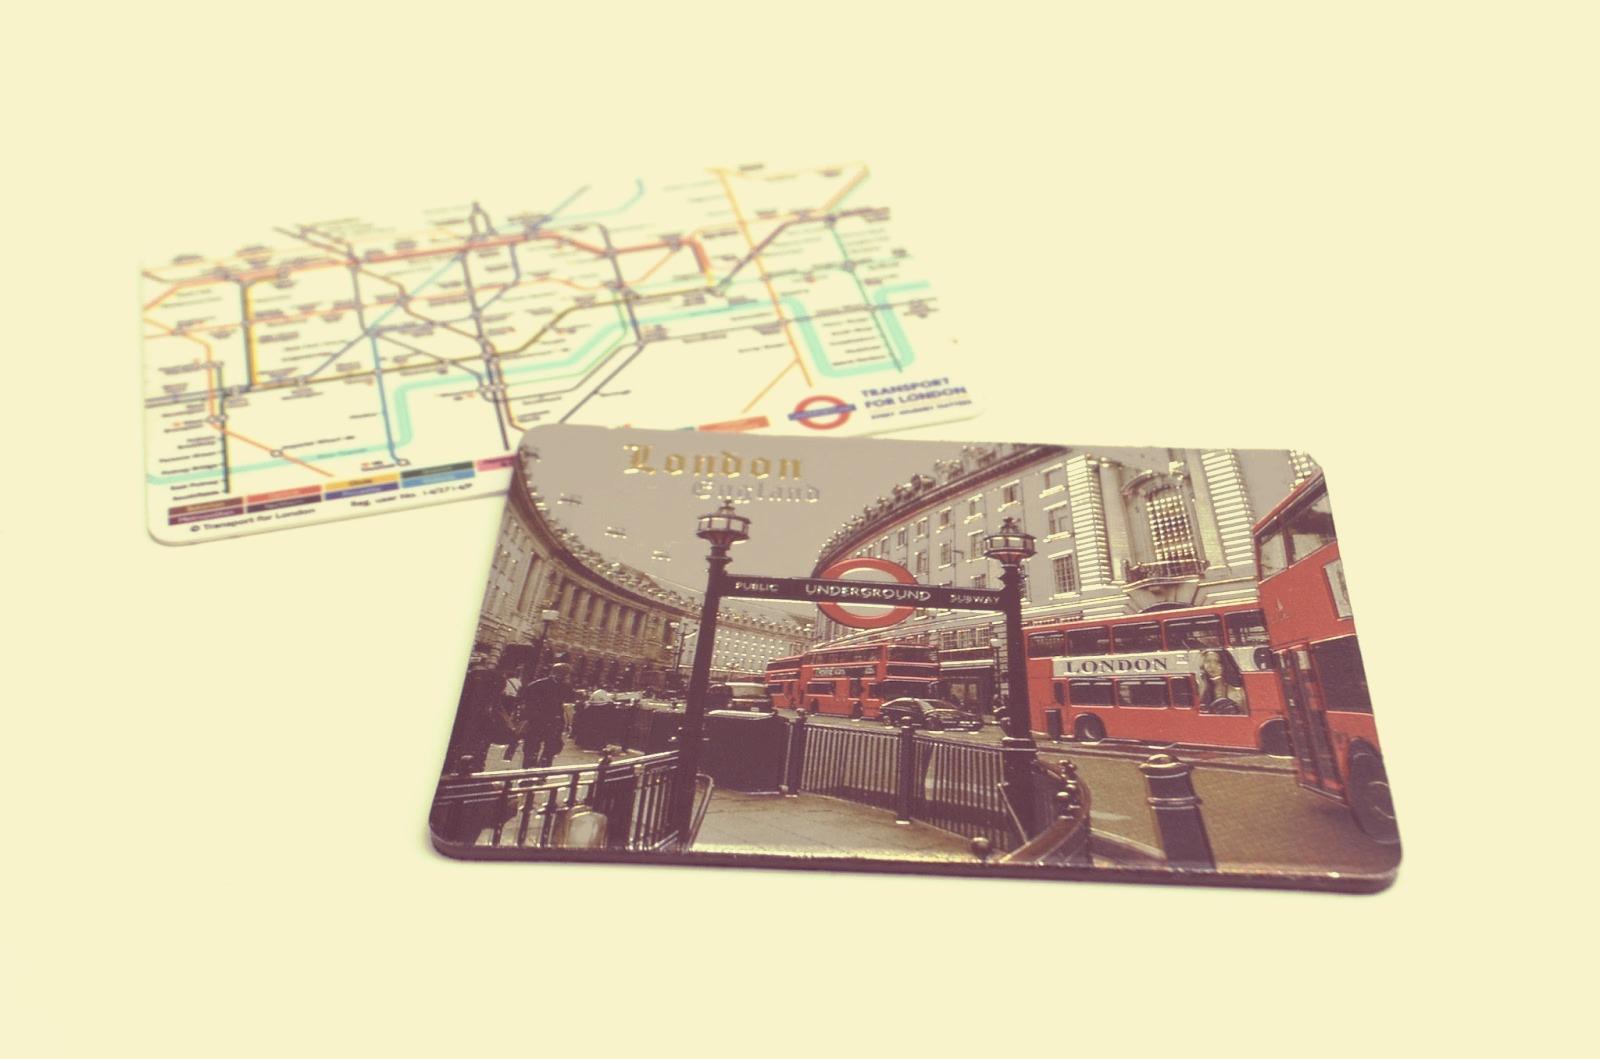 London Underground fridge magnet